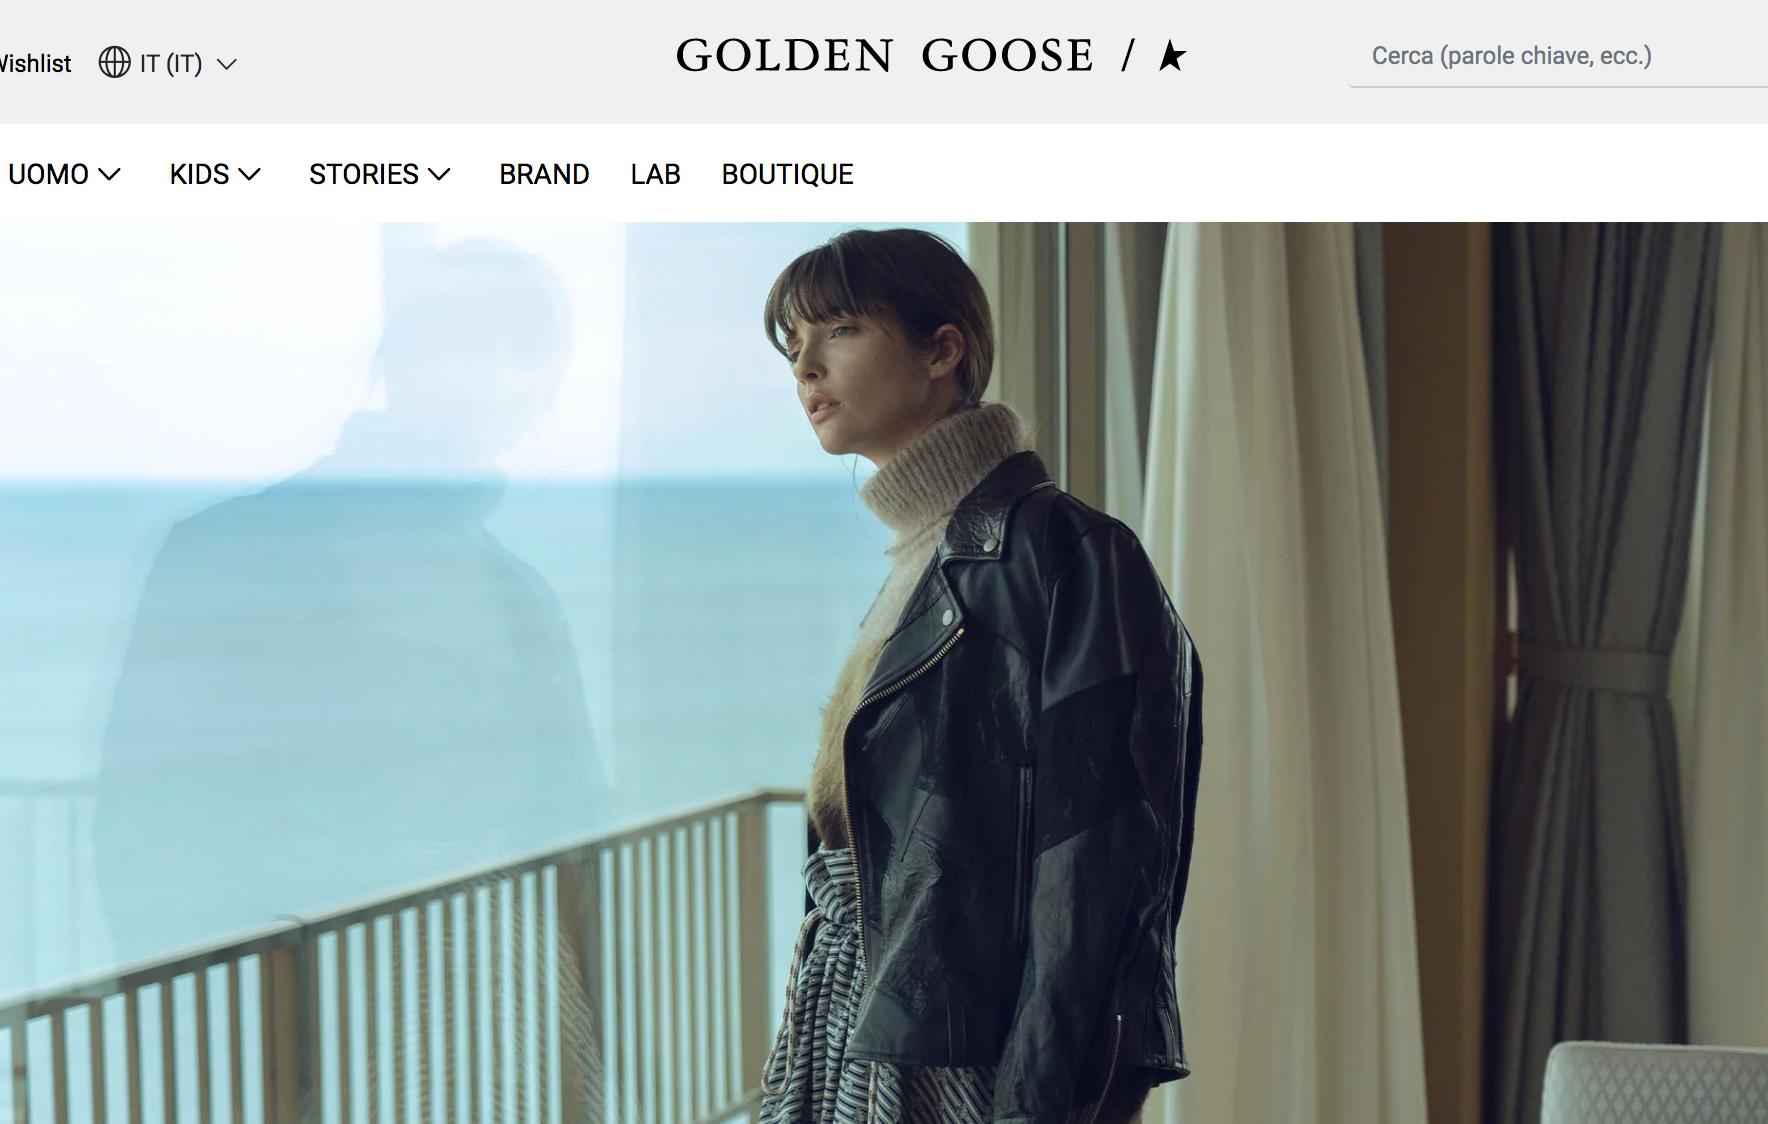 传:Gucci 前创意总监 Frida Giannini 复出加盟意大利潮鞋品牌 Golden Goose